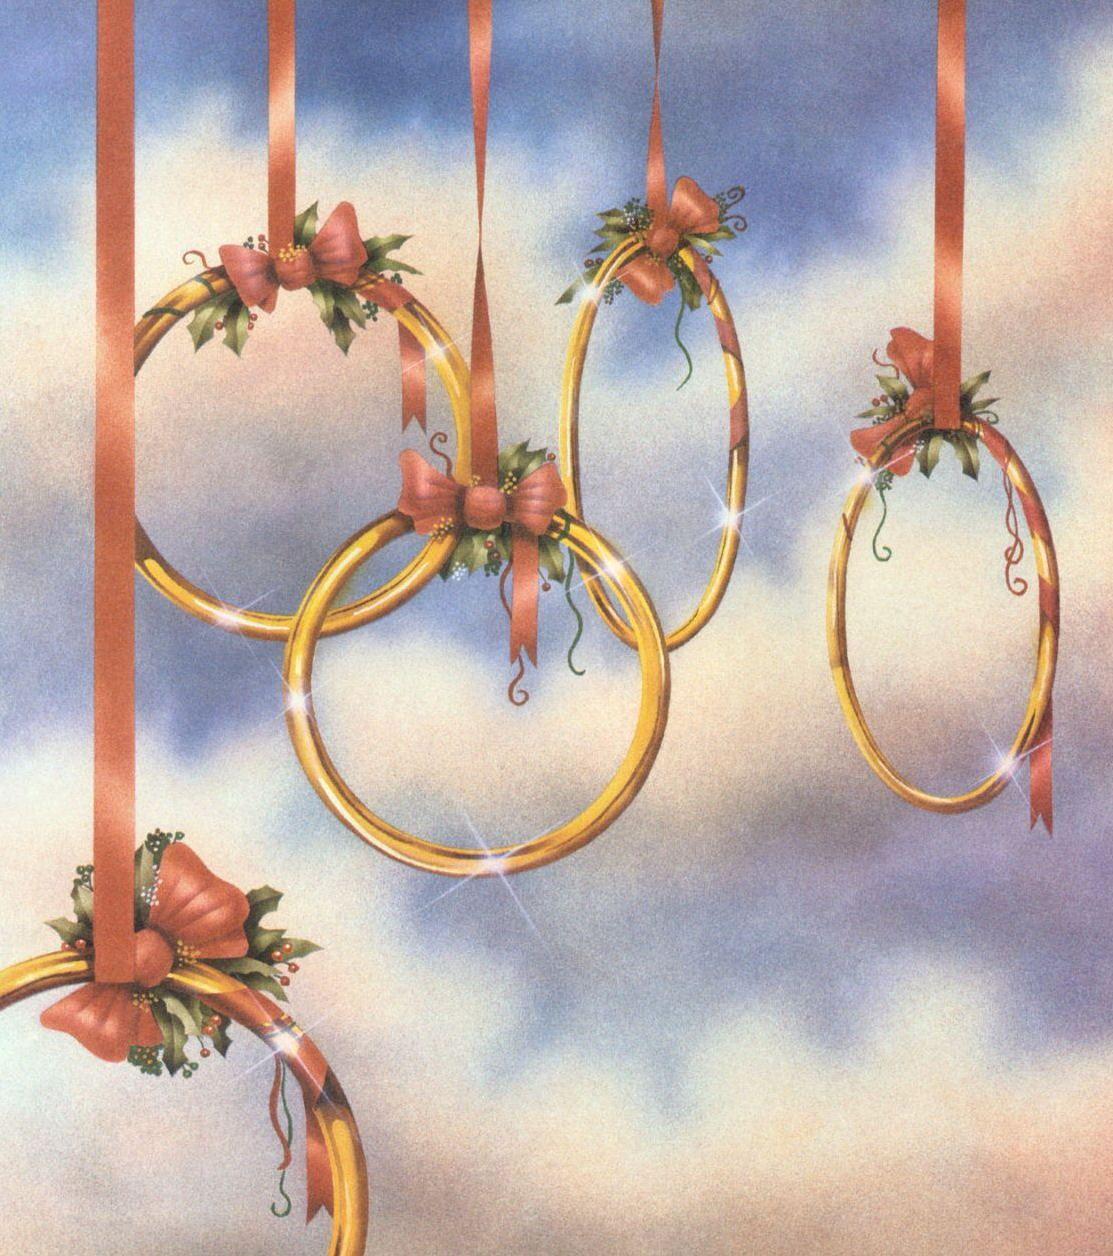 The Twelve Days Of Christmas 5 Golden Rings 12 Days Of Christmas 12 Days Of Xmas Twelve Days Of Christmas